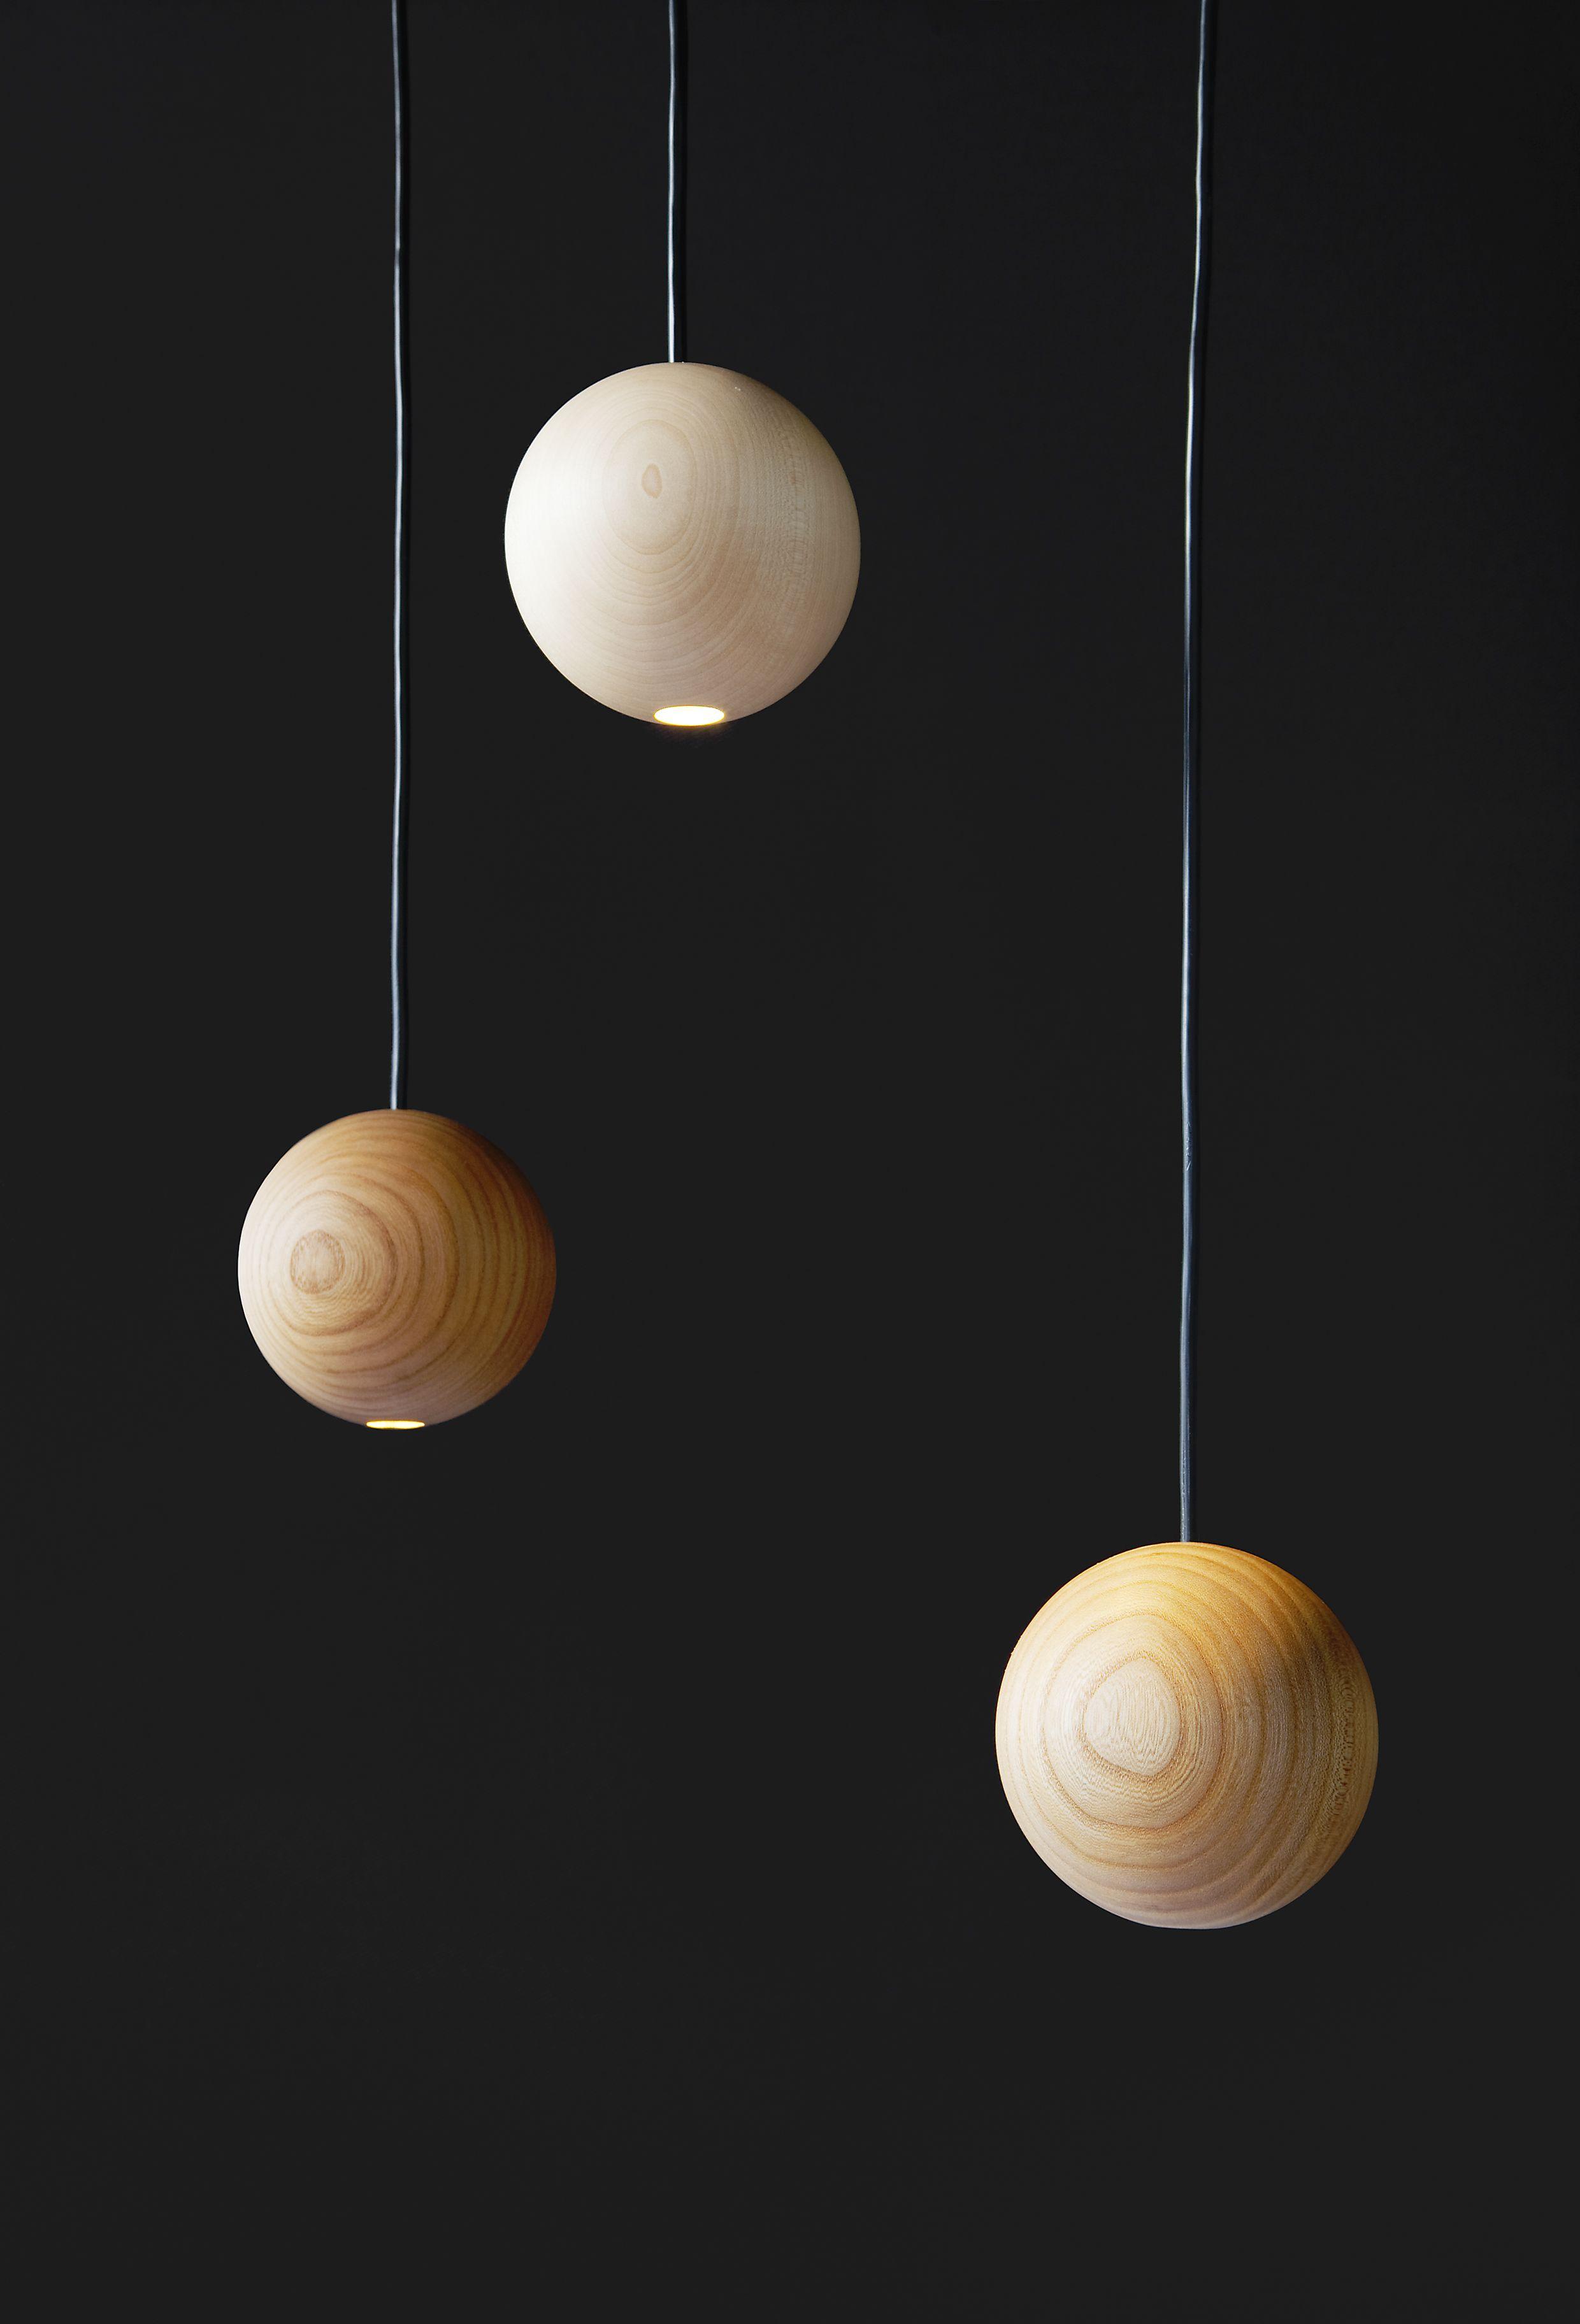 institut finlandais paris jenni roininen caf basic rauno tr skelin hires wood luminaire. Black Bedroom Furniture Sets. Home Design Ideas